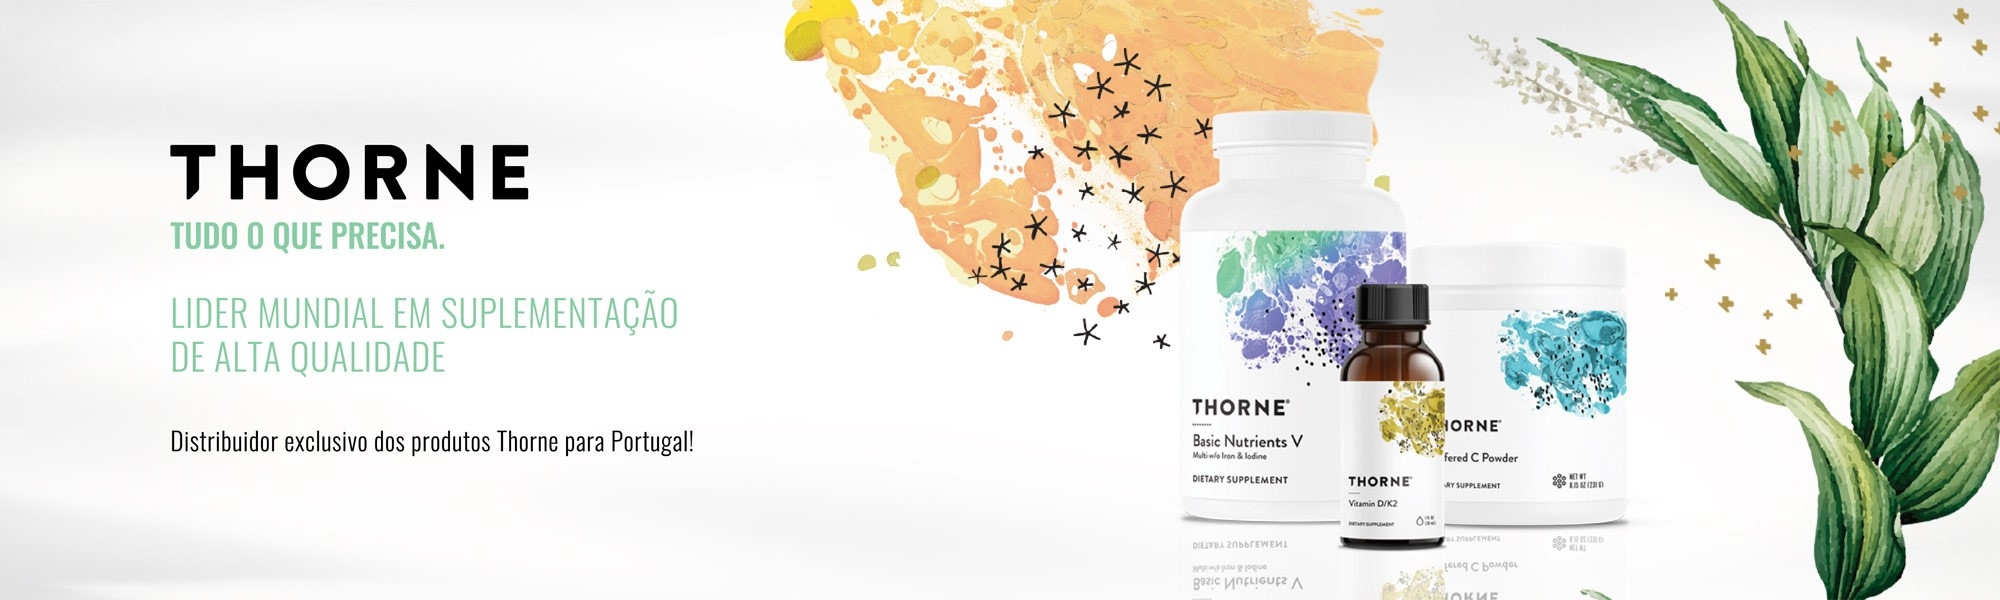 Gama de Suplementos Thorne